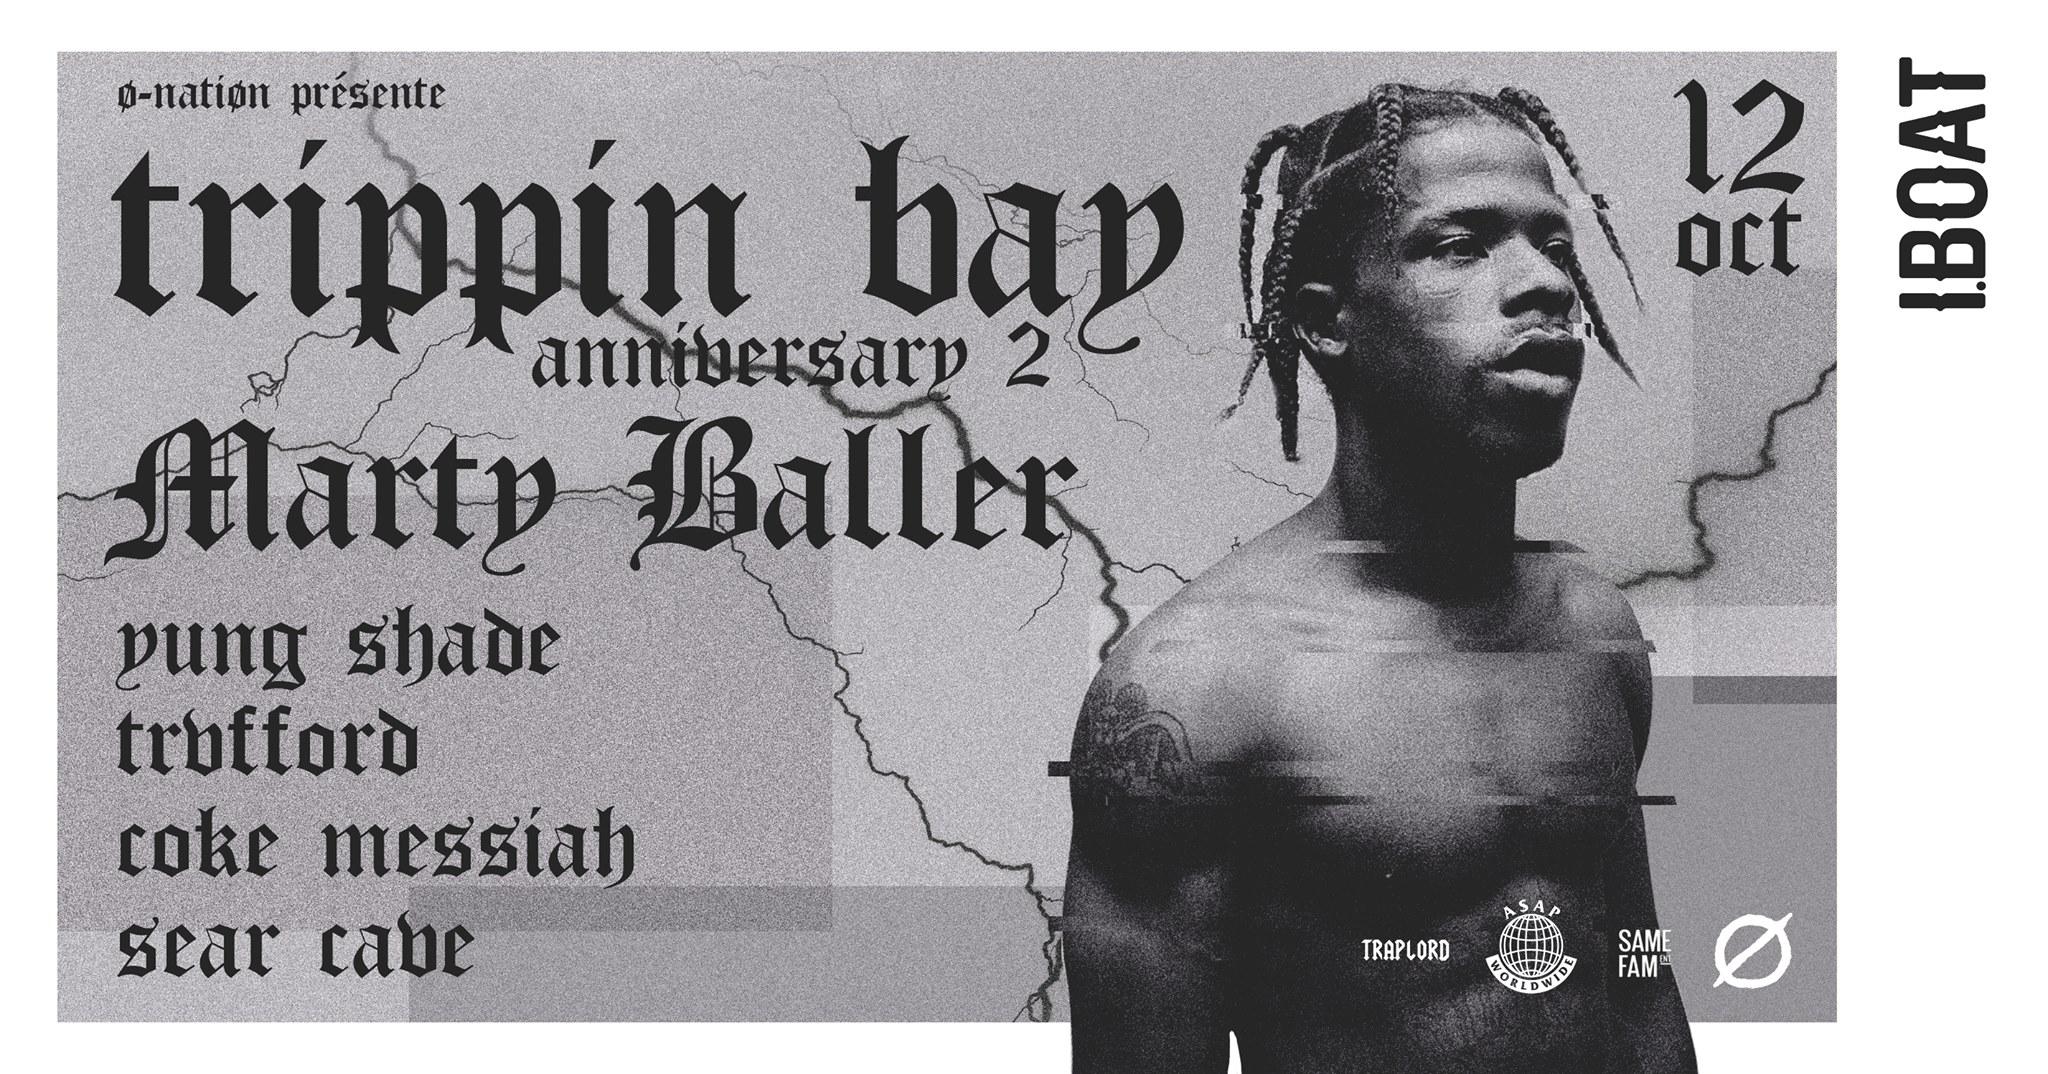 Trippin Bay Anniversary w: Marty Baller.jpg